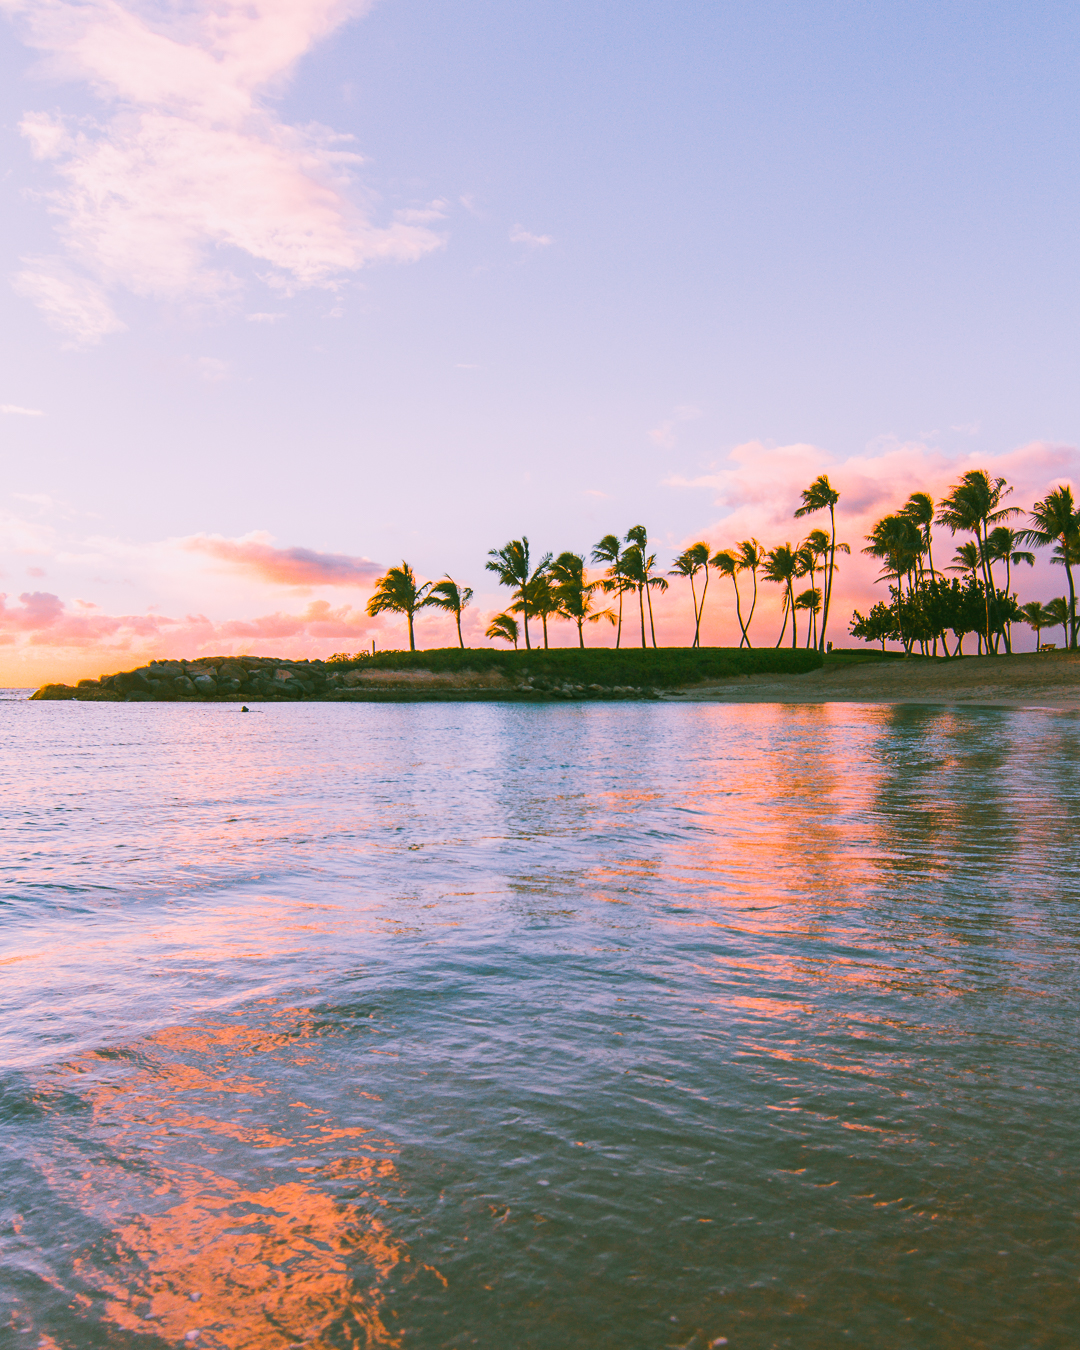 The Beautiful Ko'Olina Resort Lagoon during sunset - 15 Best Beaches on Oahu